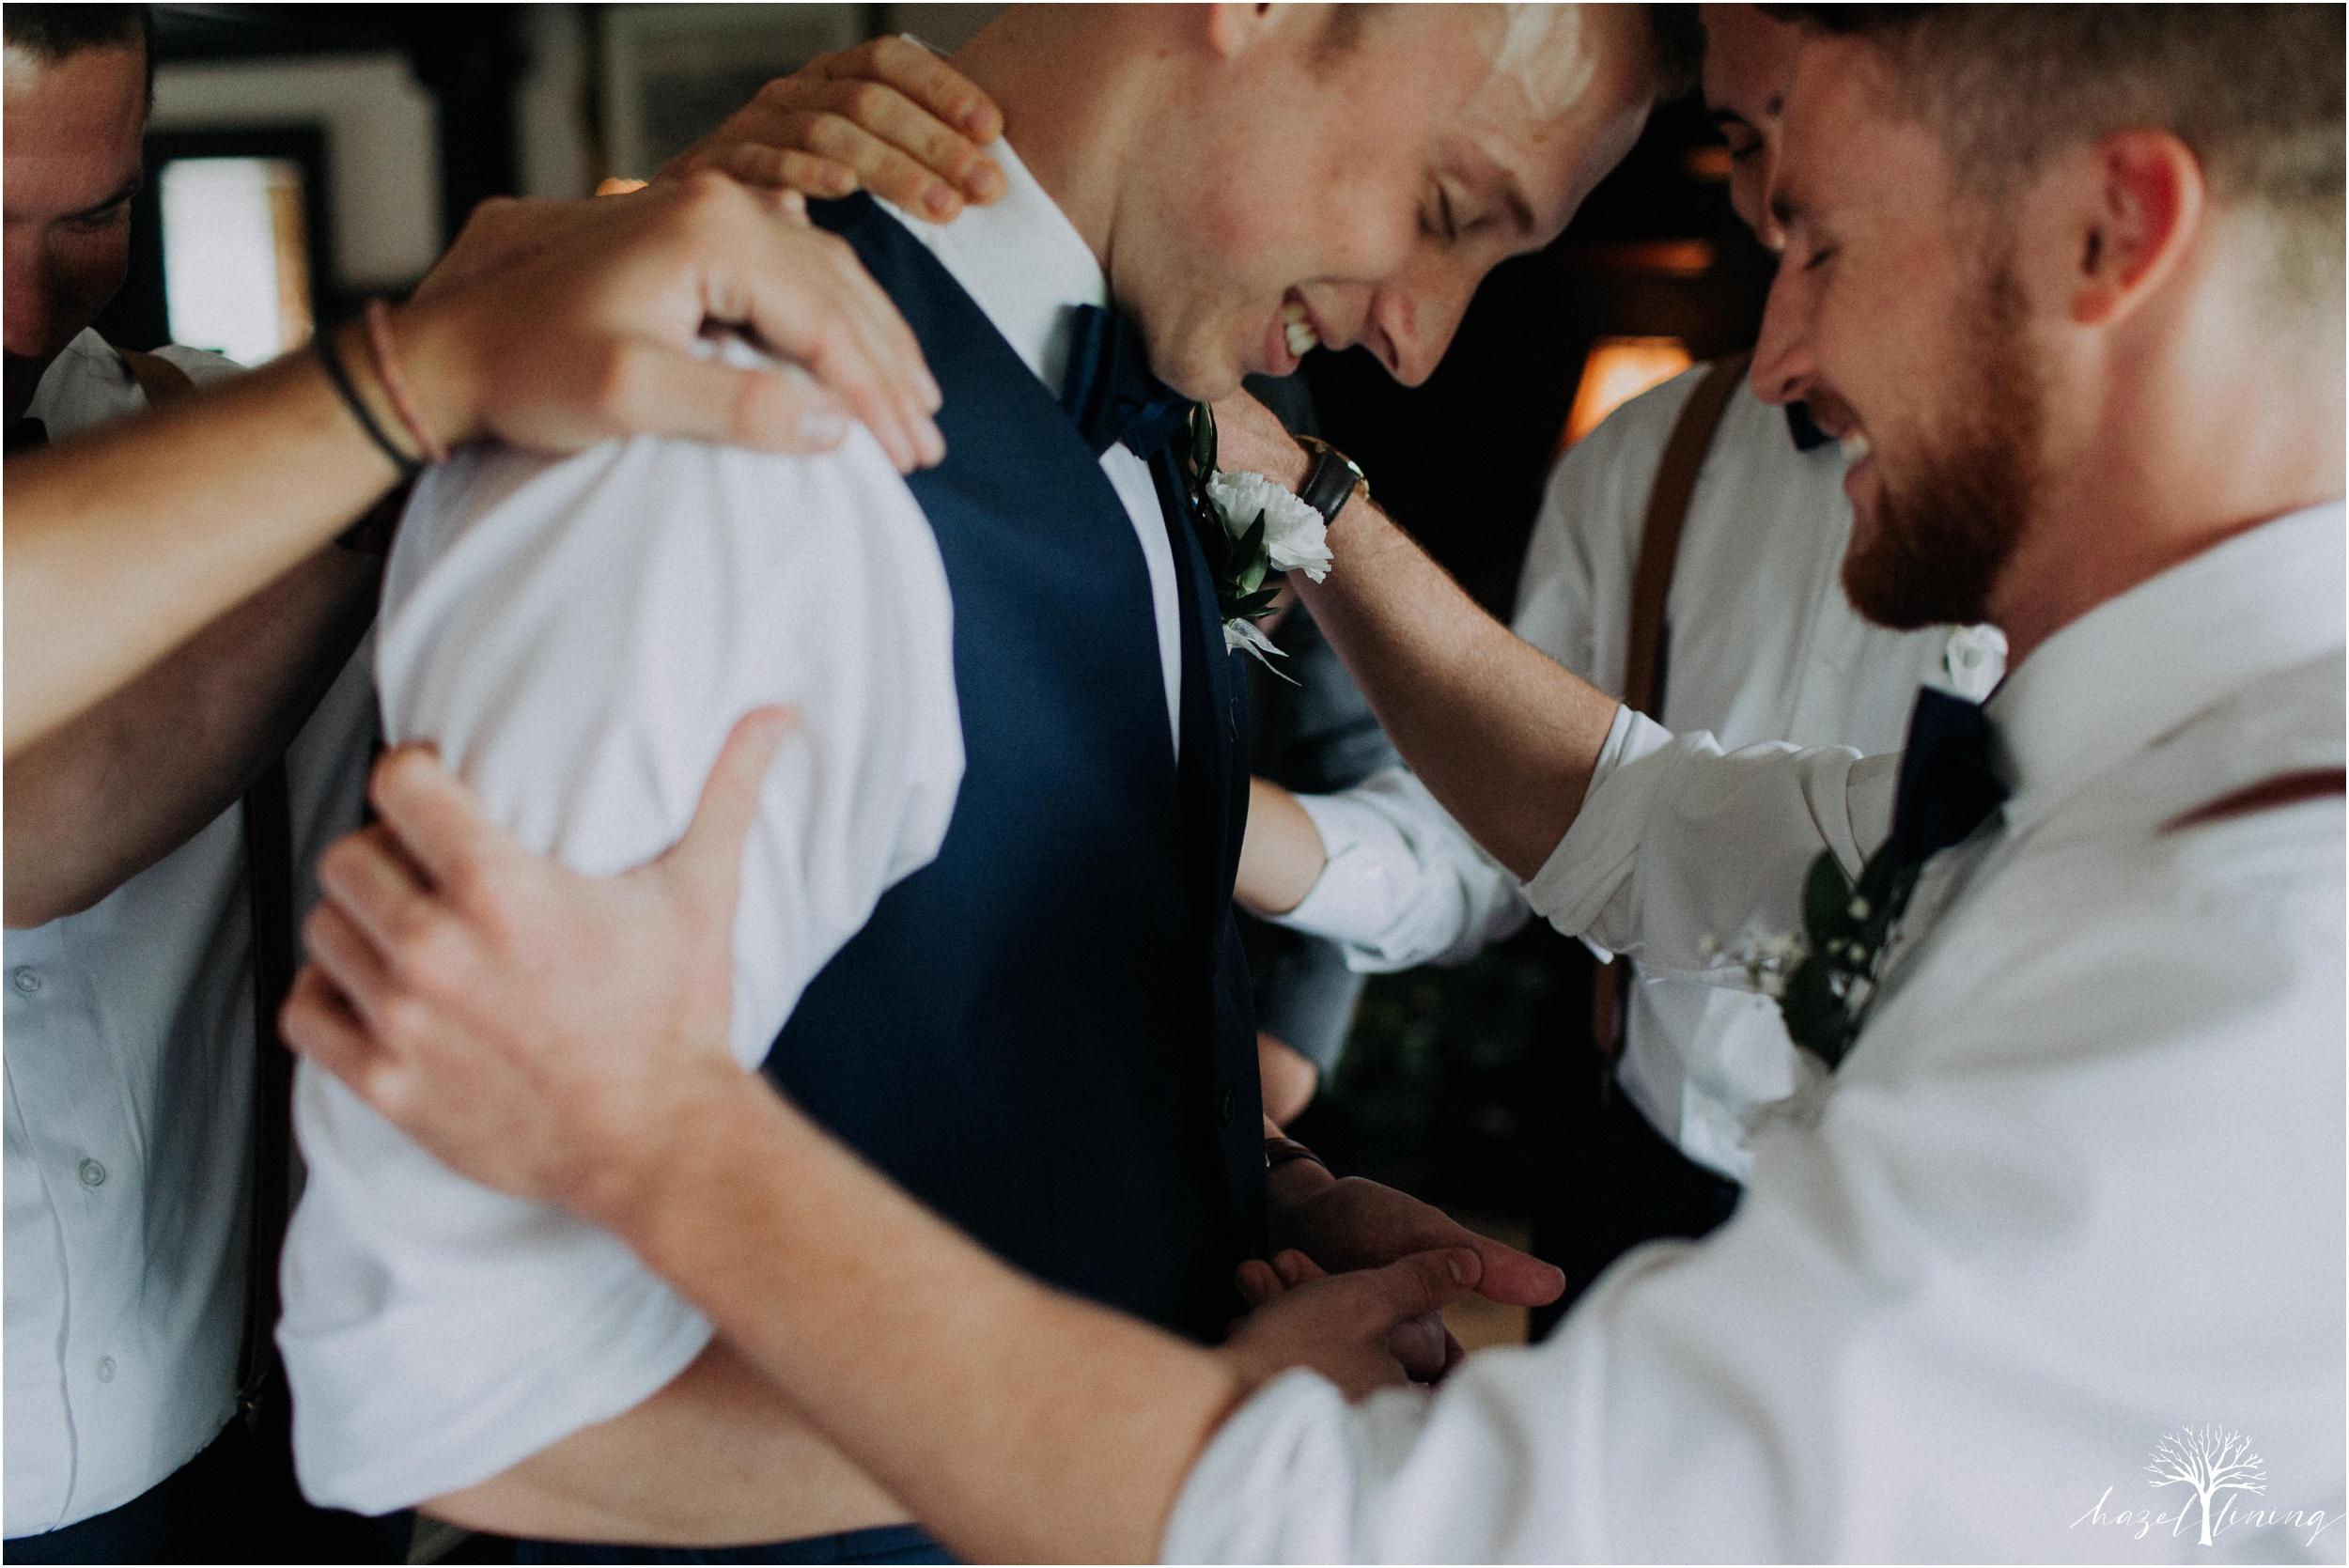 mariah-kreyling-samuel-sherratt-sherrattwiththeworld-peirce-farm-at-witch-hill-boston-massachusetts-wedding-photography-hazel-lining-travel-wedding-elopement-photography_0067.jpg